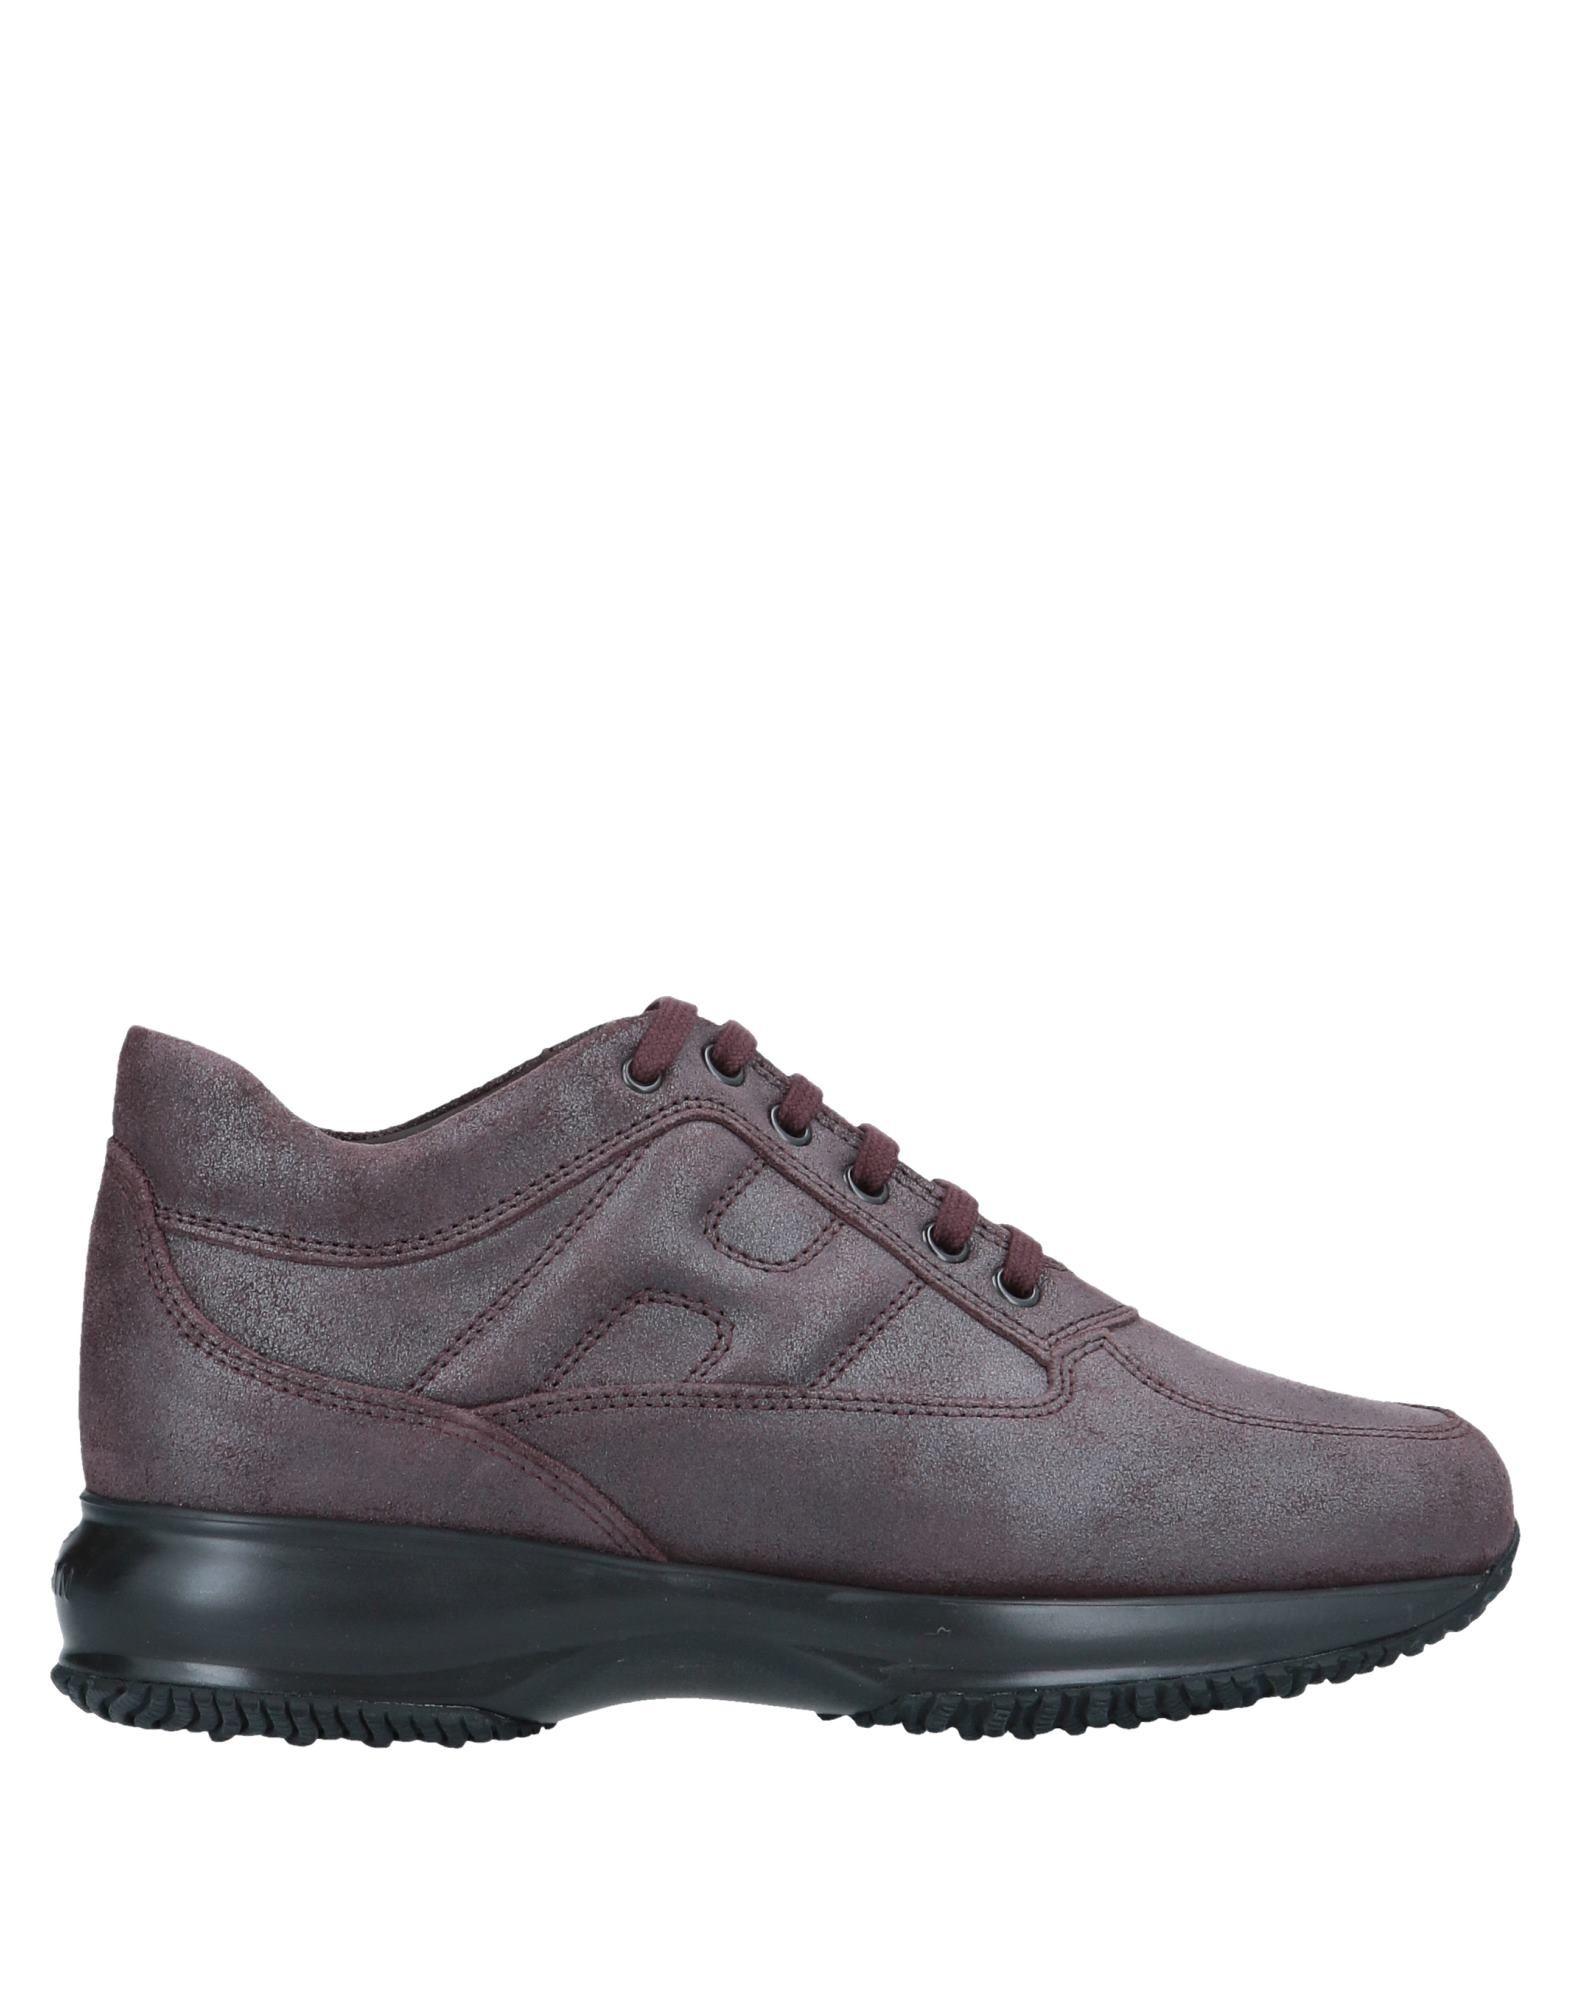 Hogan Sneakers Damen  11567568ERGut aussehende strapazierfähige Schuhe